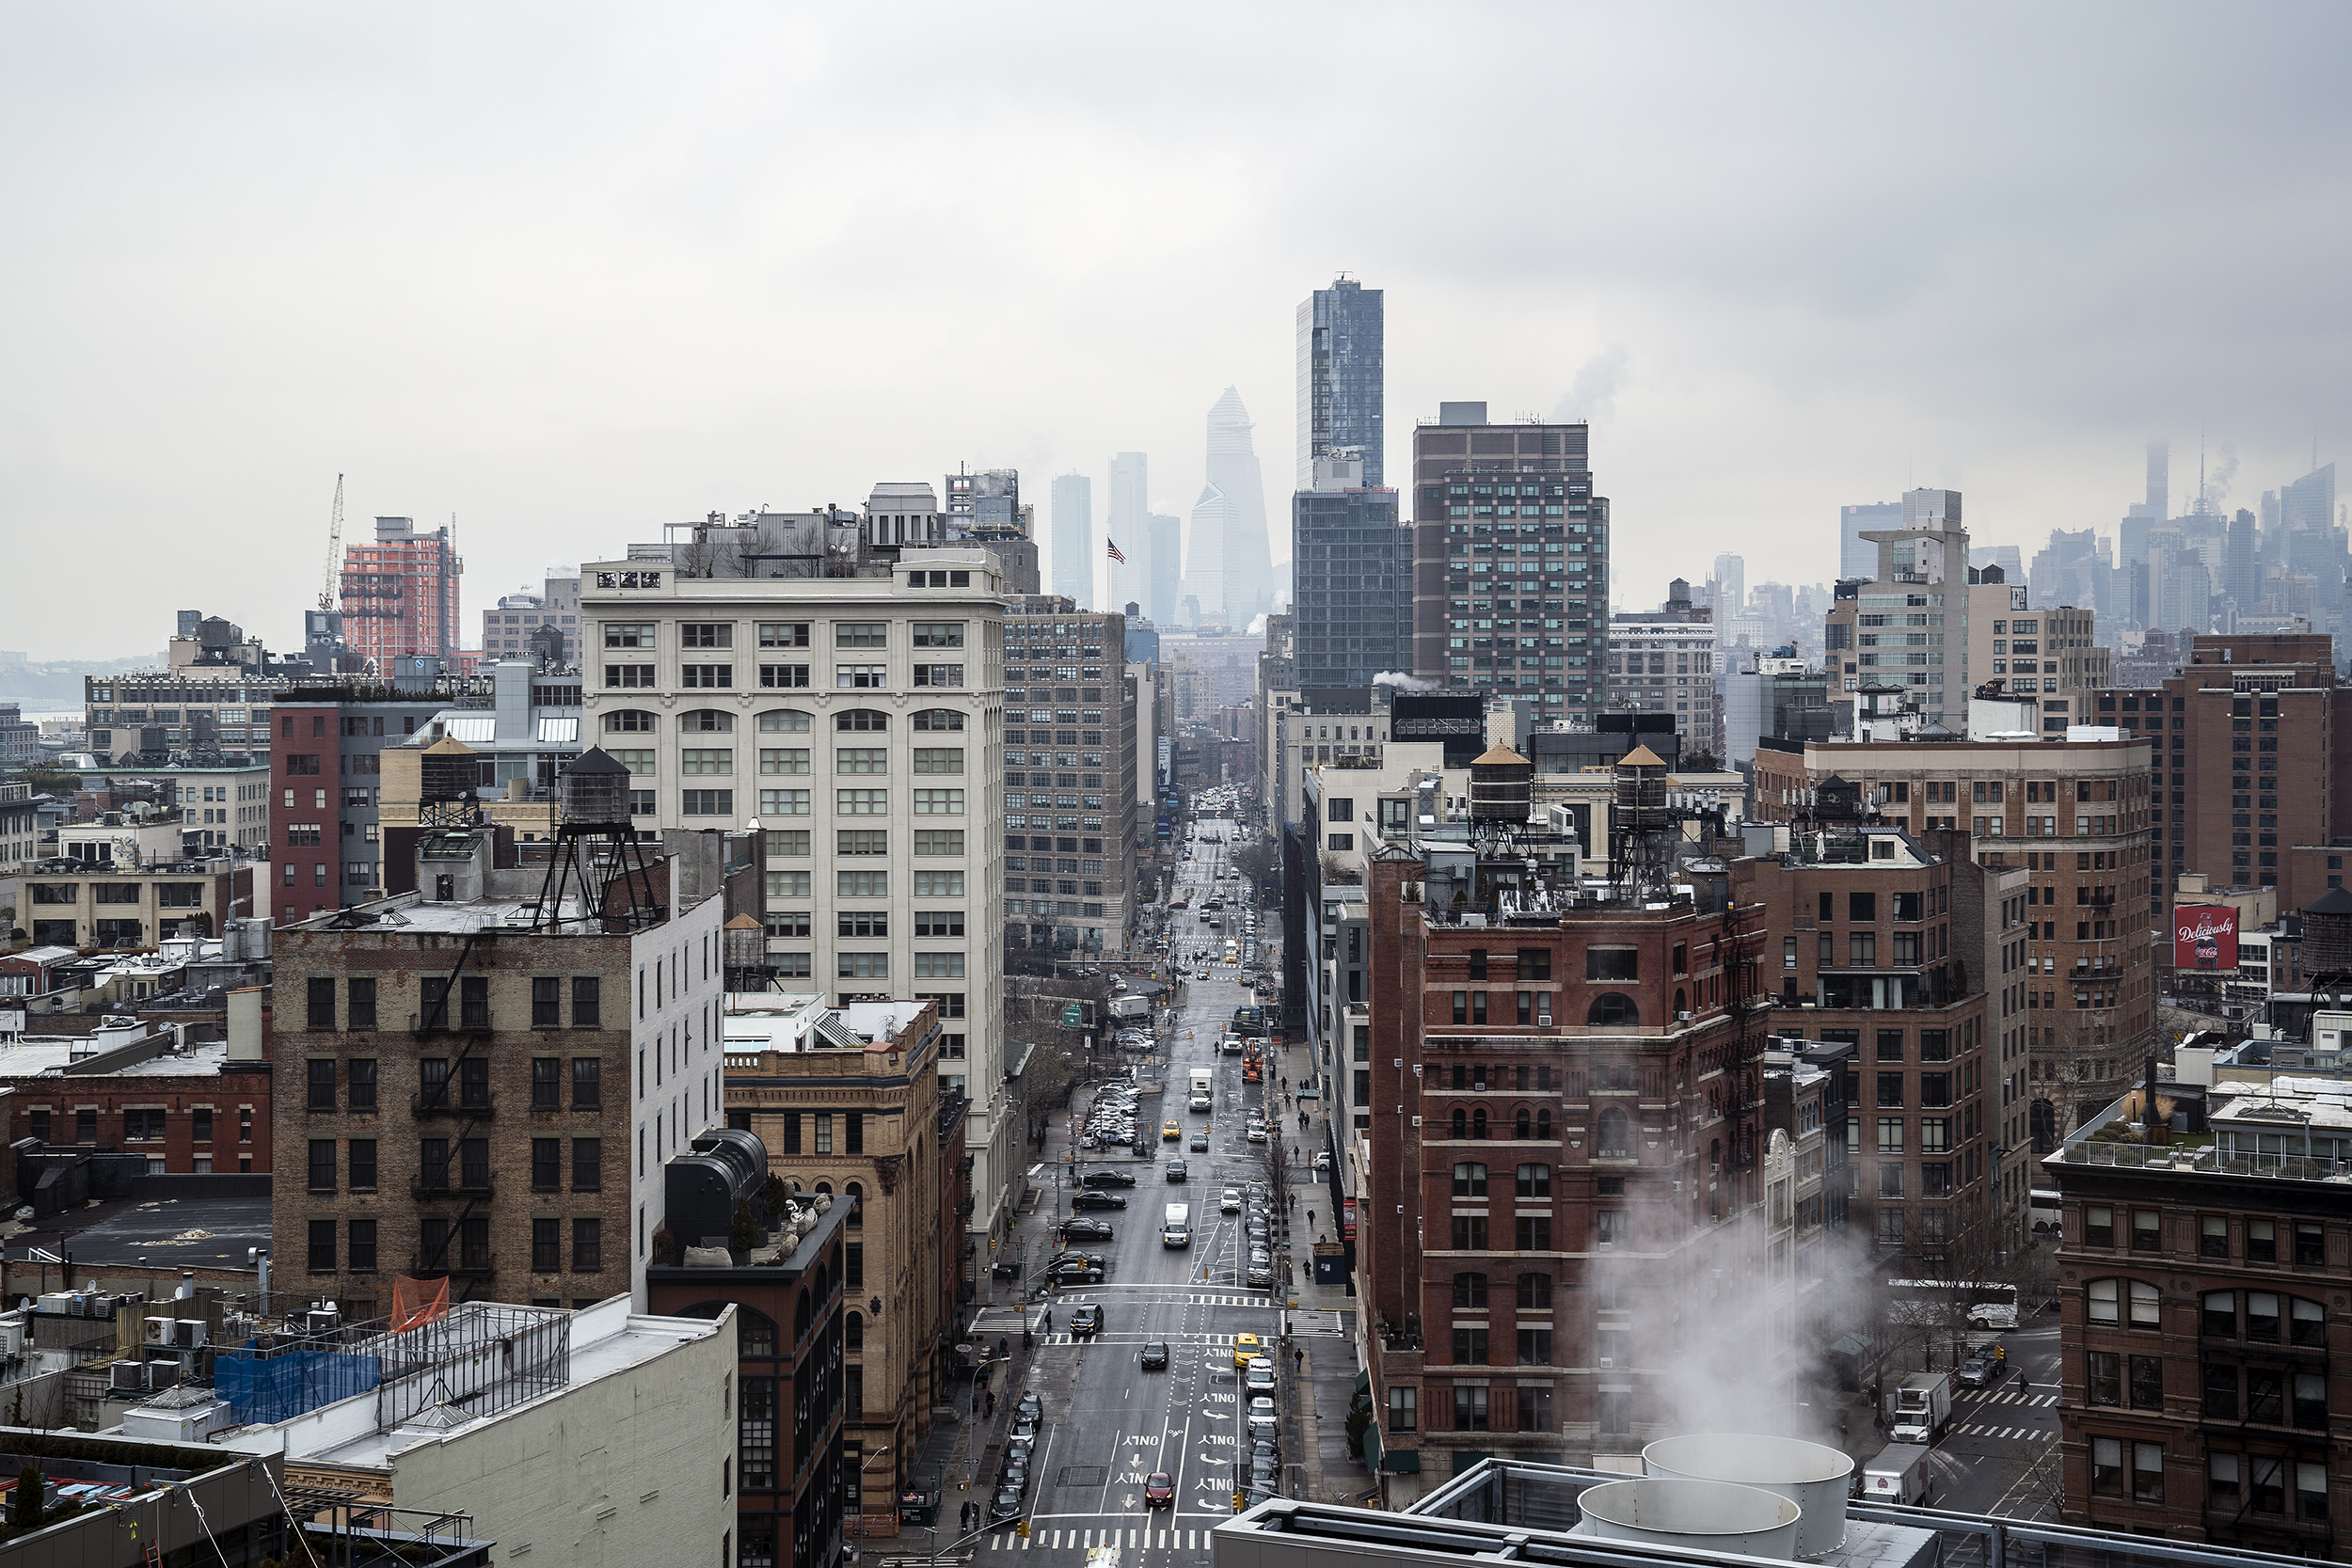 newyork-CCB03350-edited-web.jpg